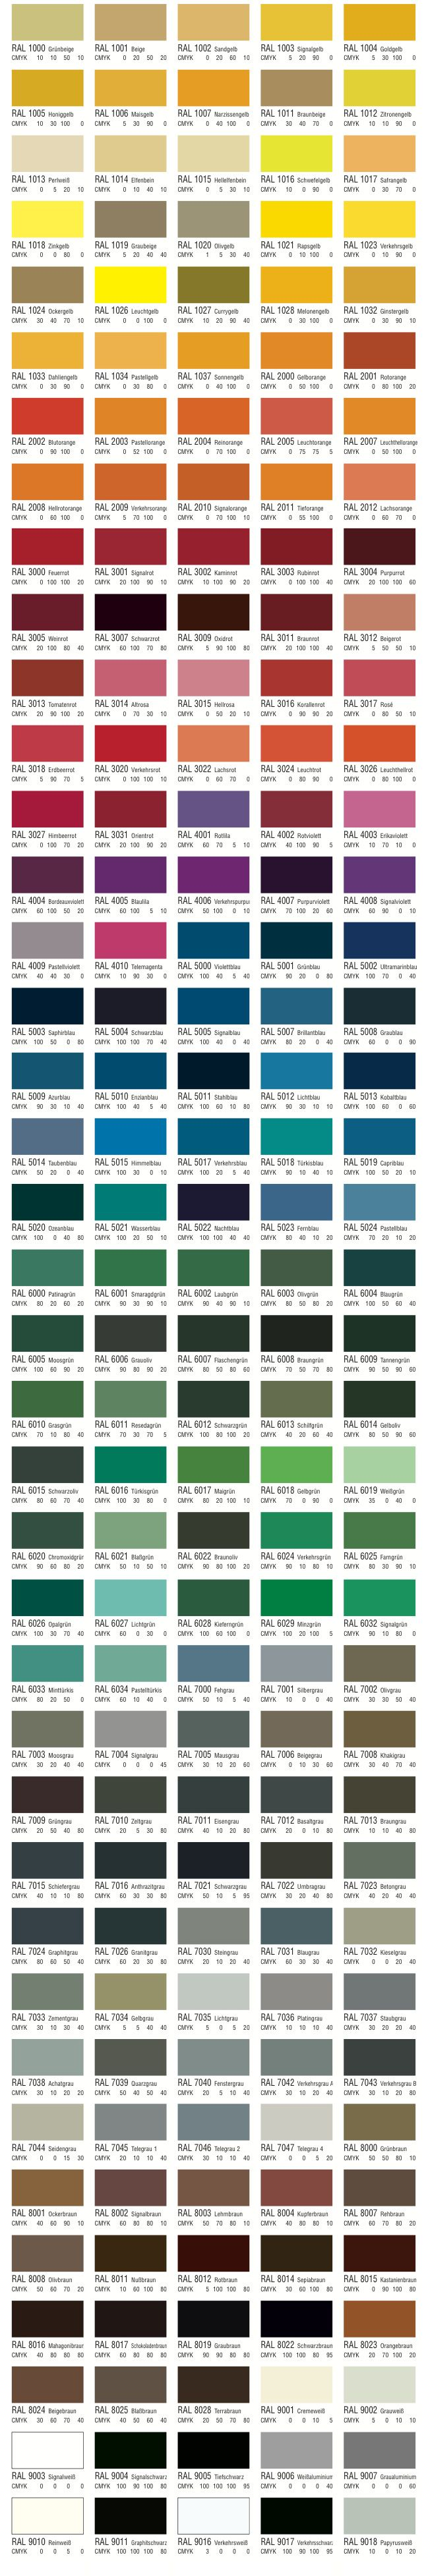 Ral Pantone tabella colori ral цветовые схемы ral colours